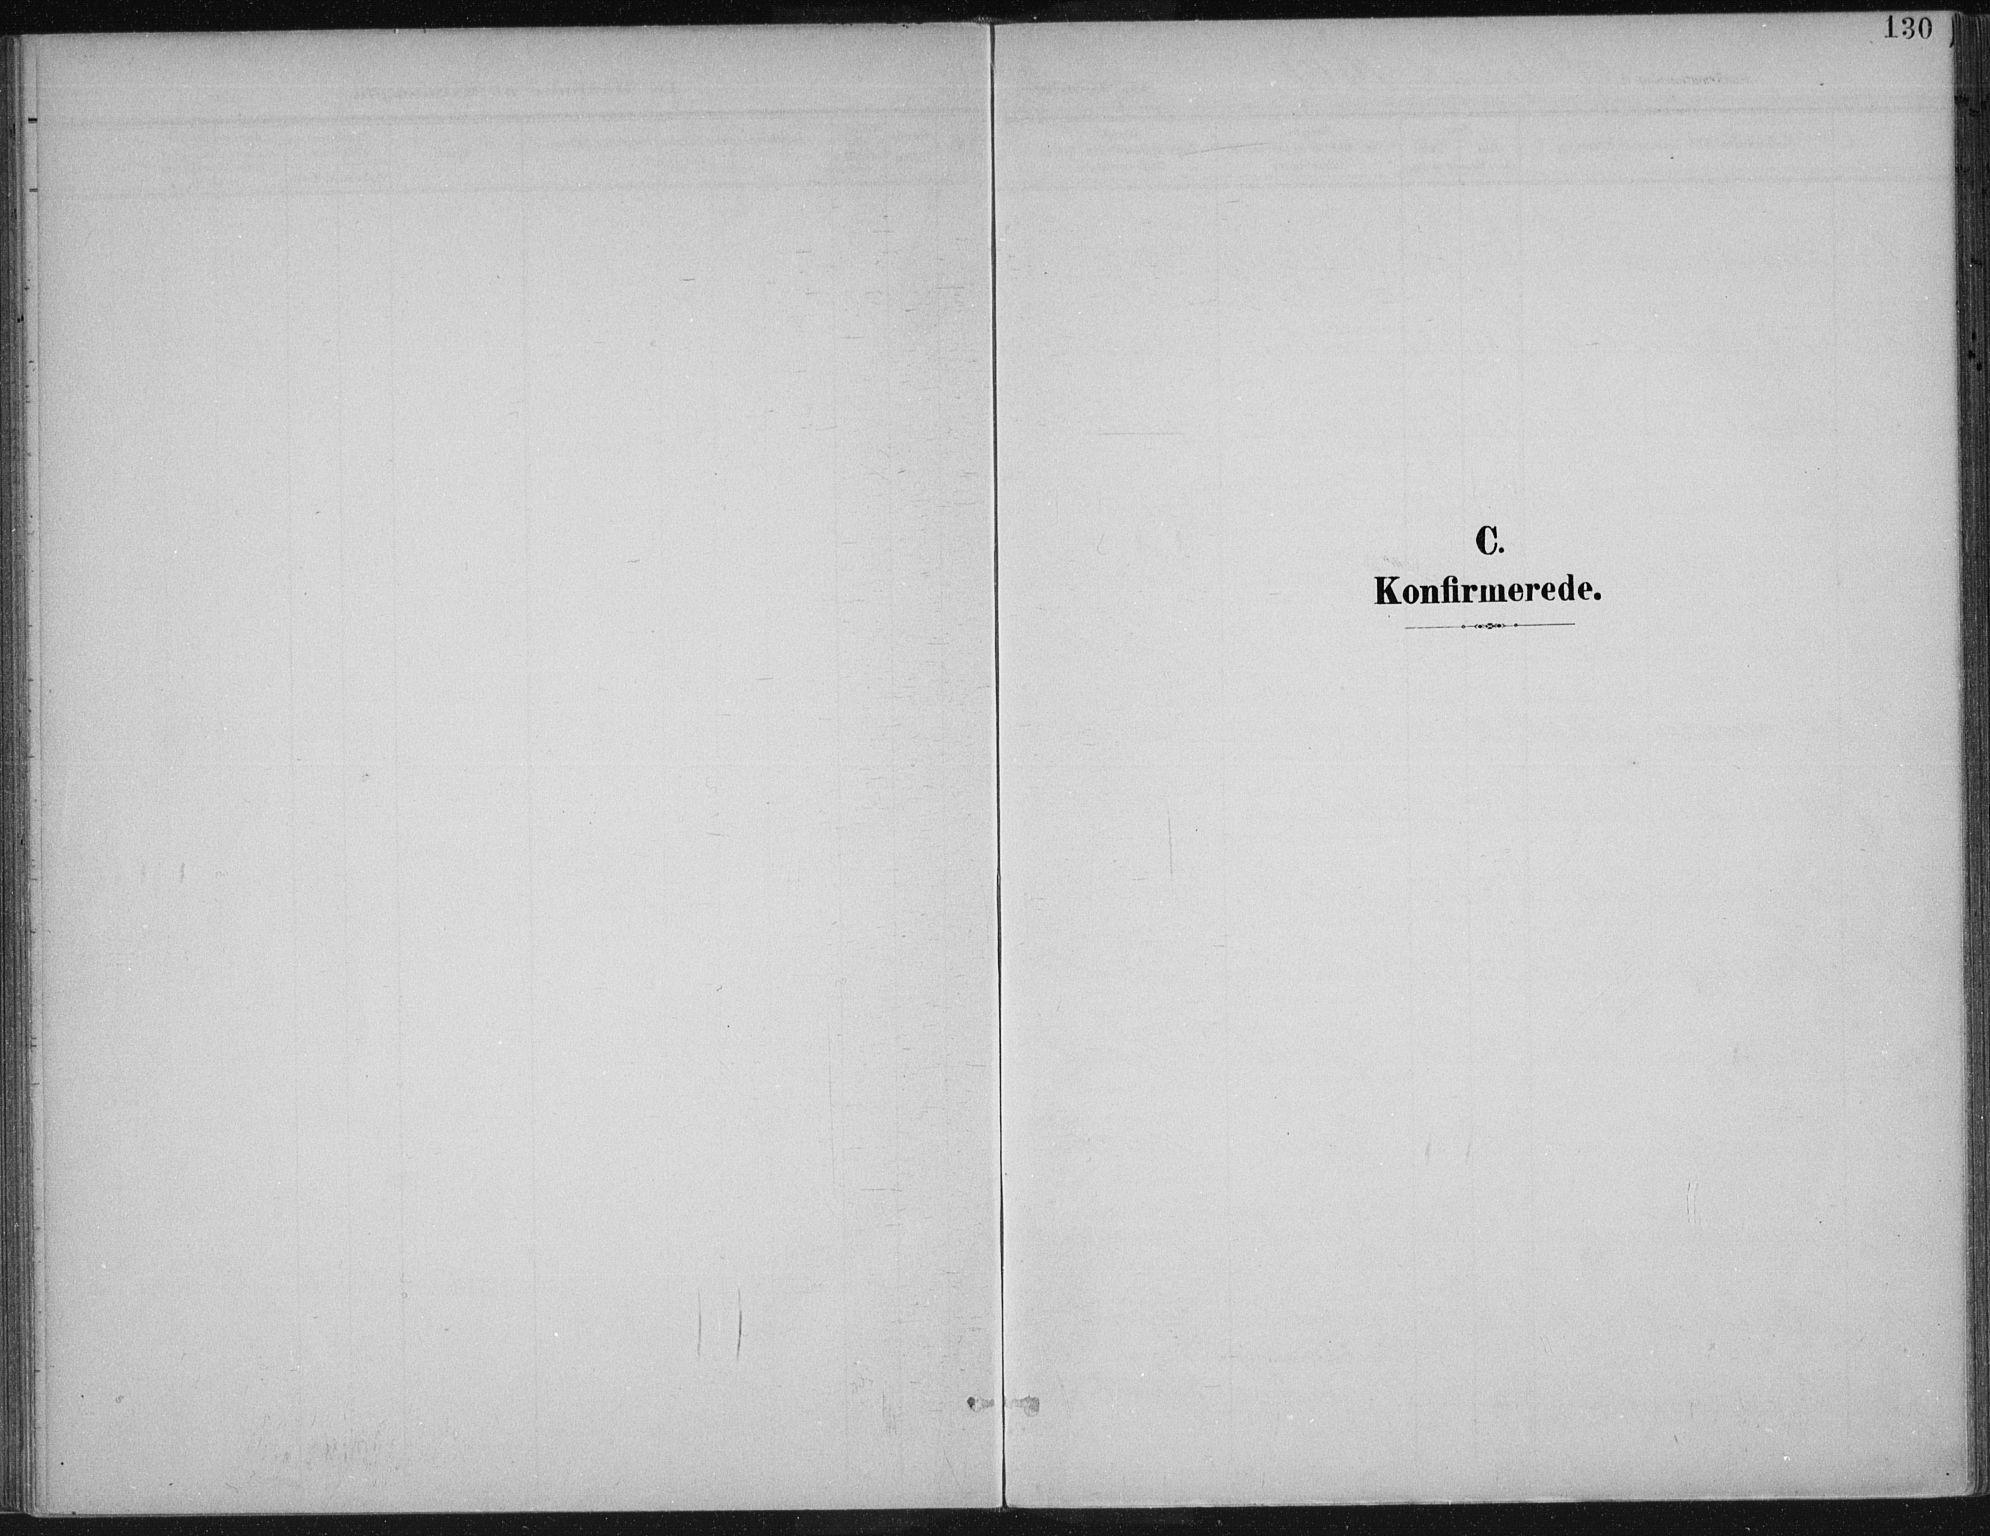 SAH, Vardal prestekontor, H/Ha/Haa/L0013: Ministerialbok nr. 13, 1901-1911, s. 130